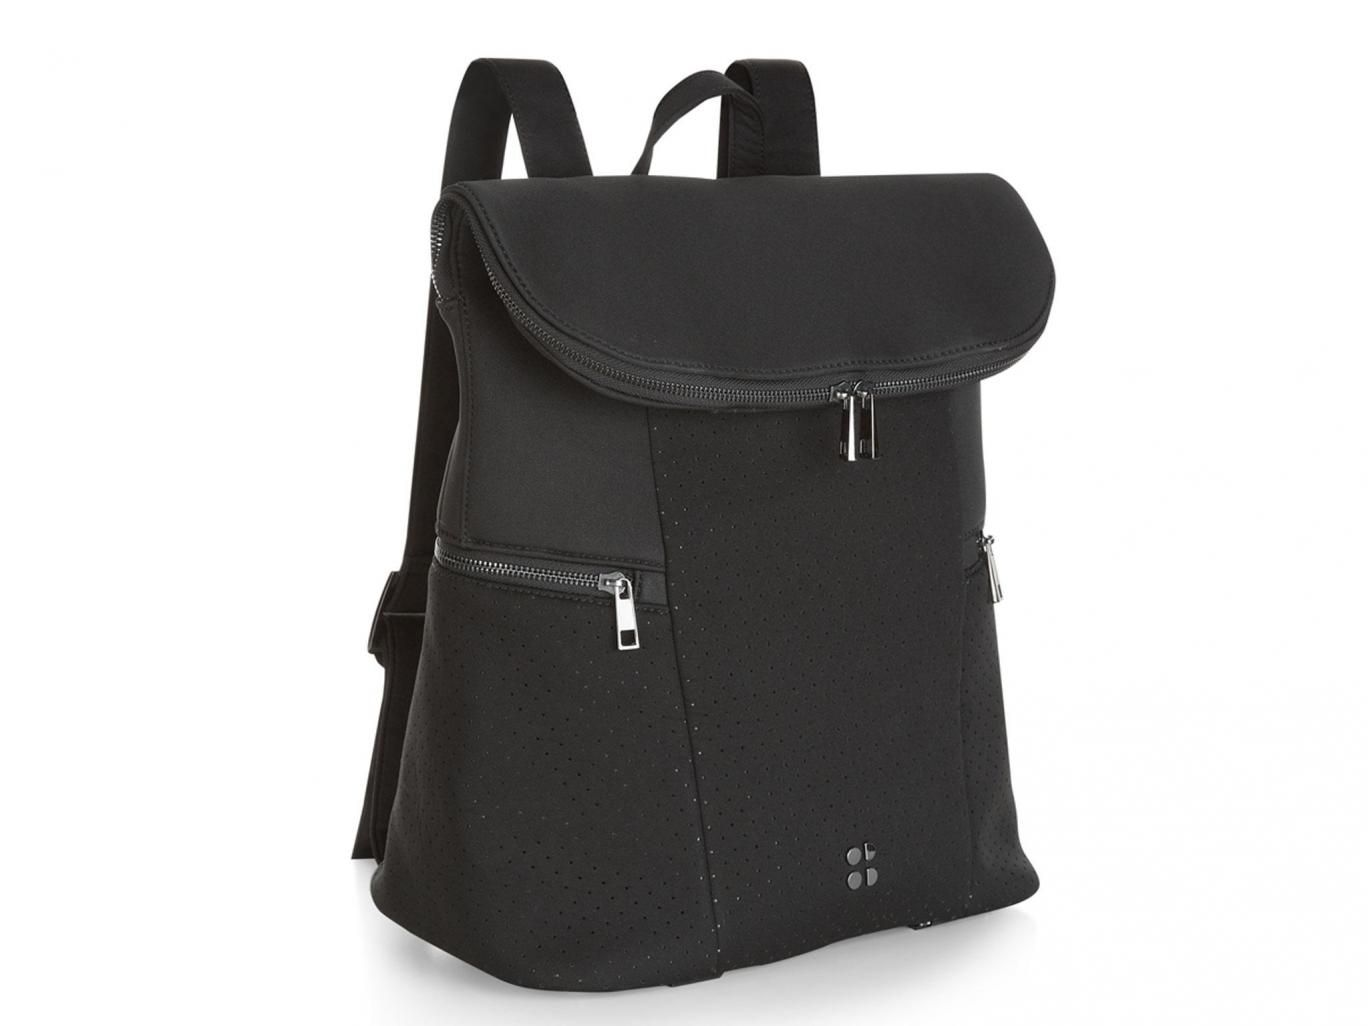 b8648558ec 10 best gym bags for women